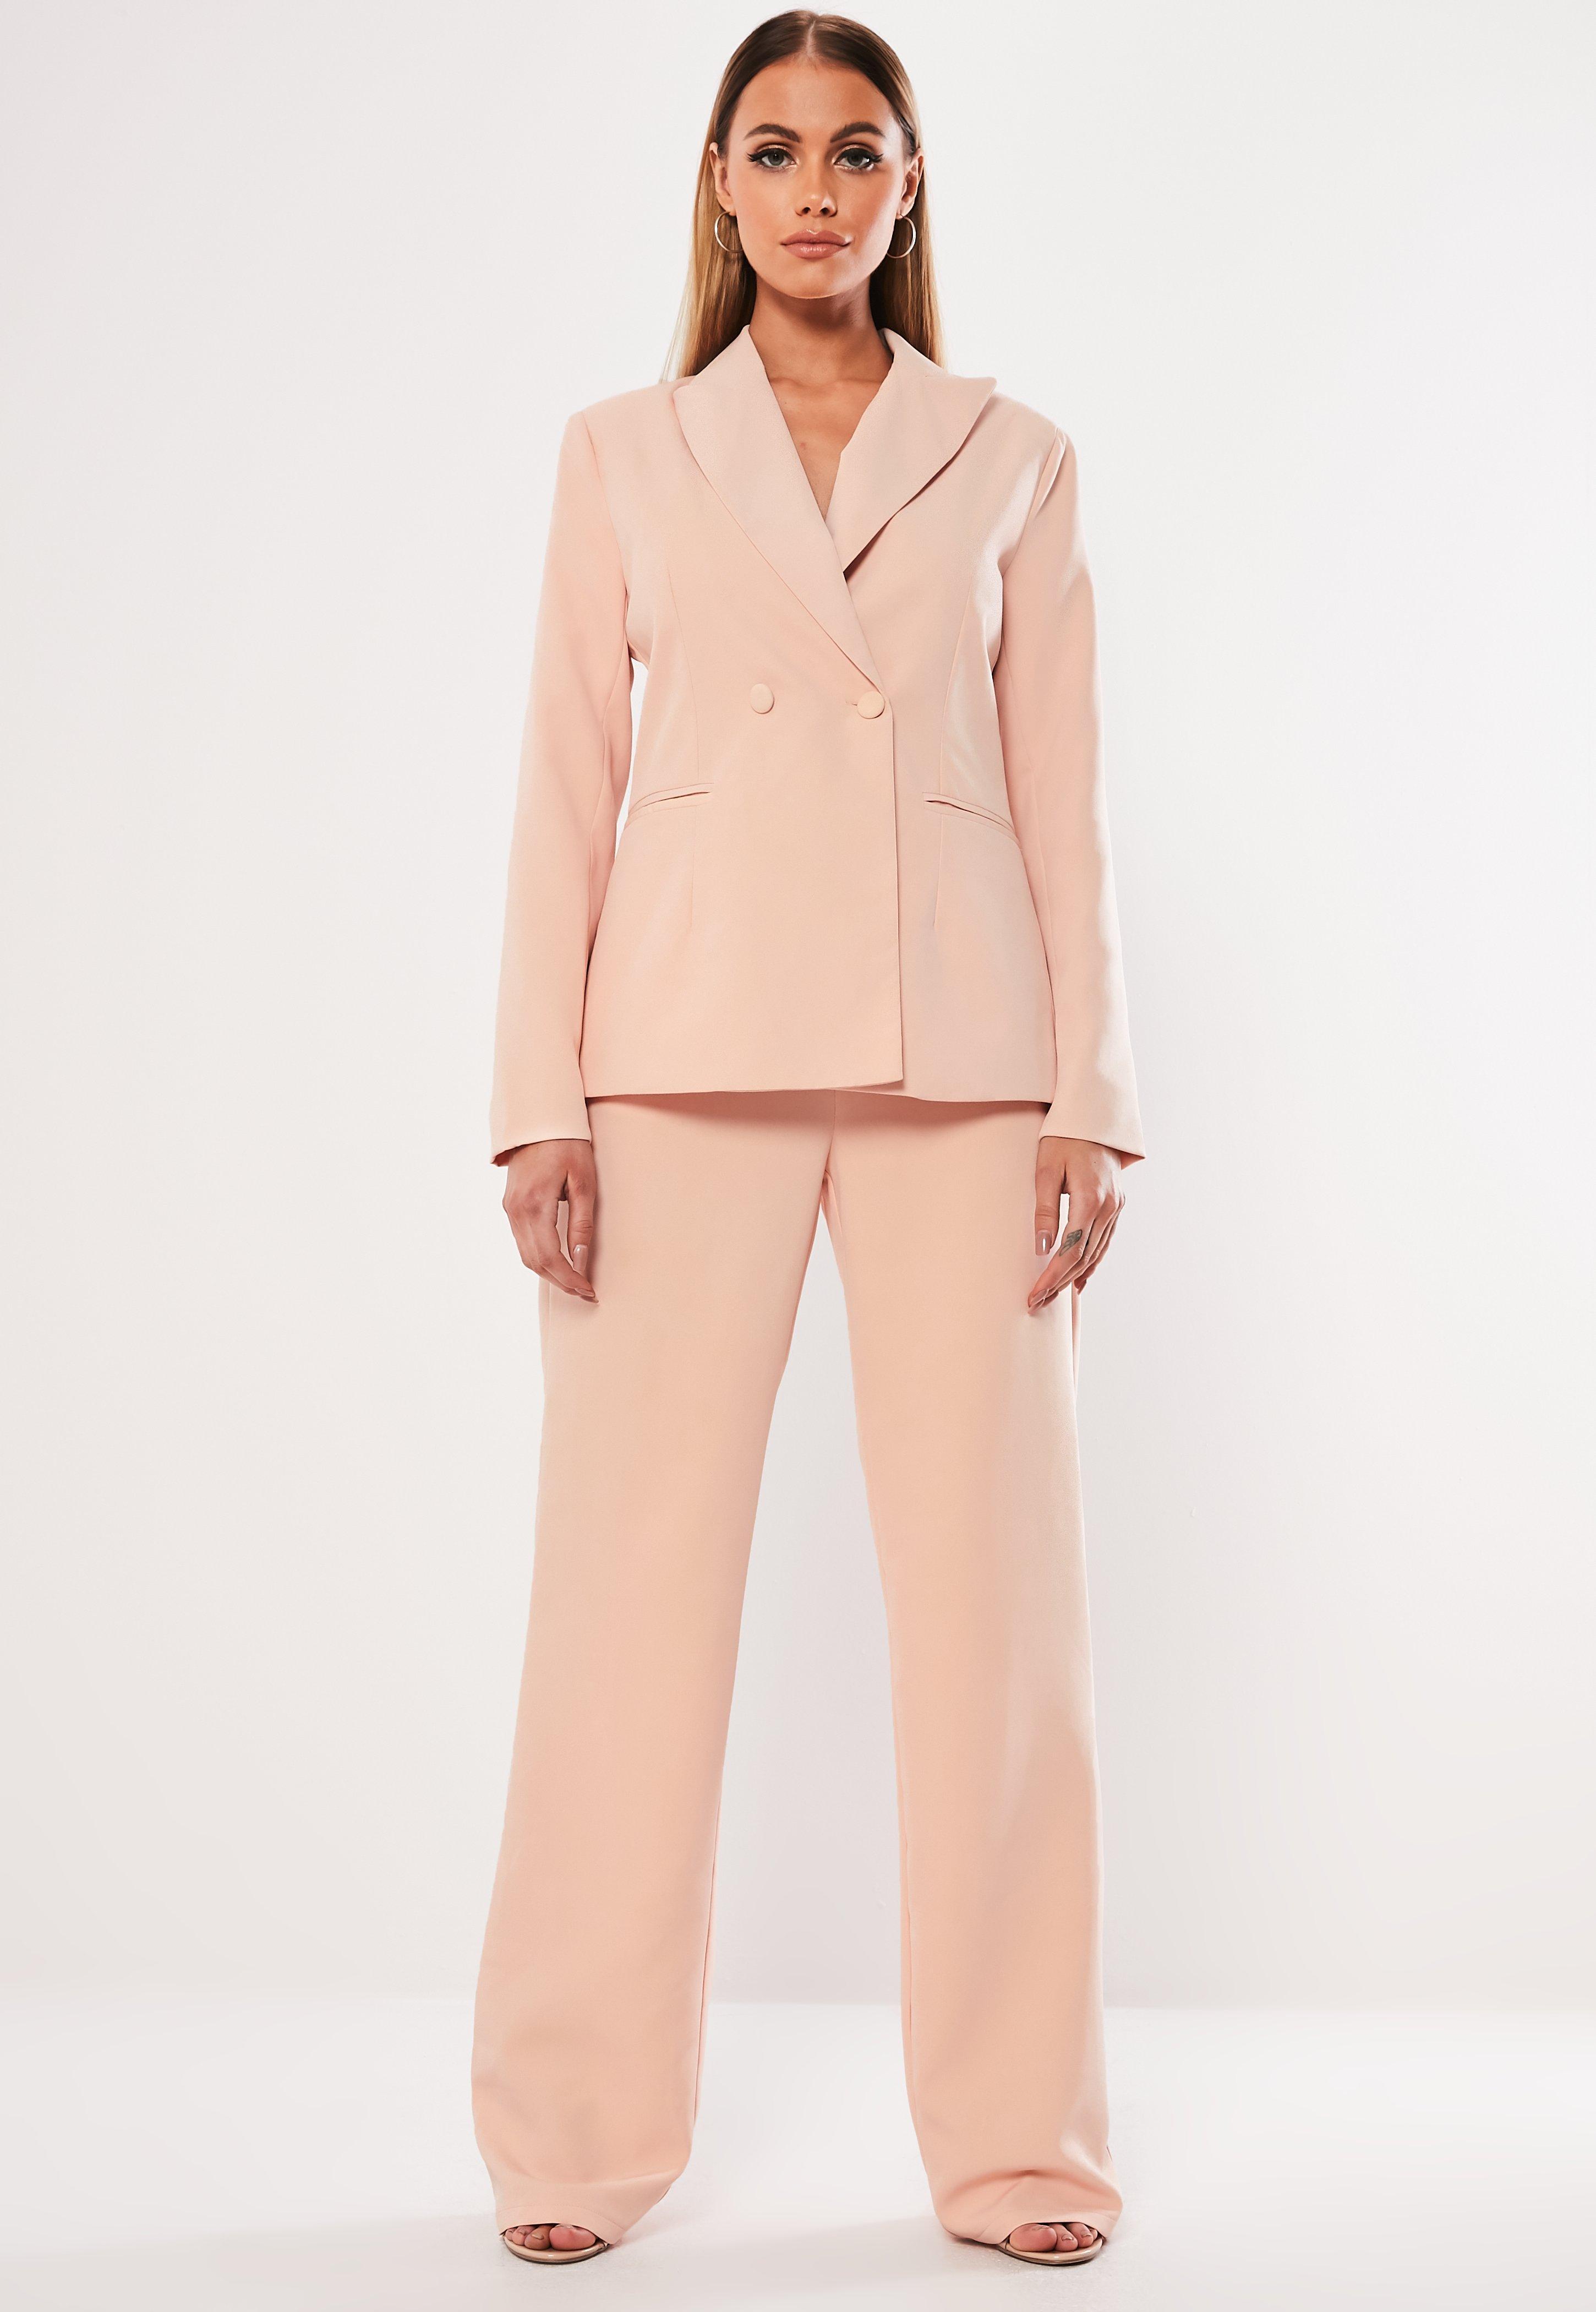 900b6707db7d Blazers for Women - Shop Smart & Tweed Blazers UK - Missguided